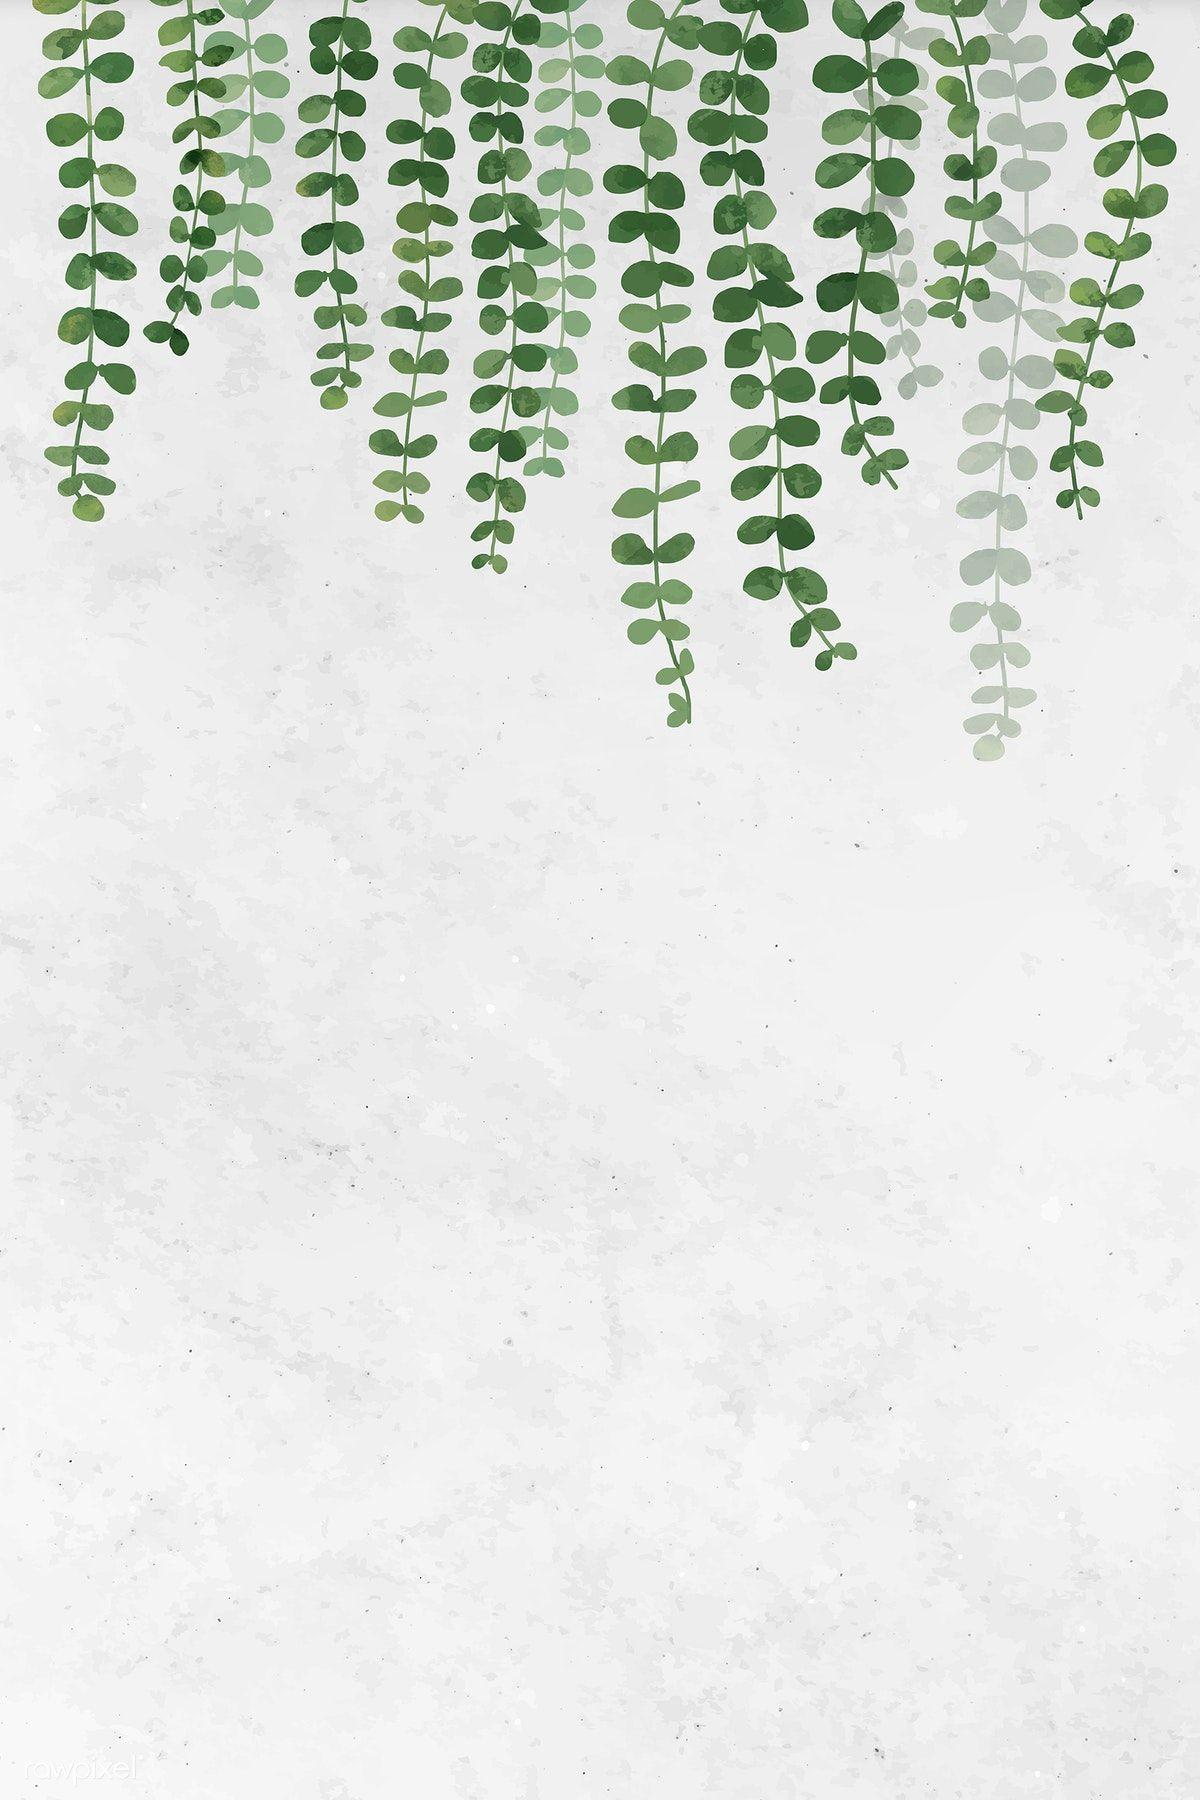 Download premium vector of Blank leafy frame design vector 1208572